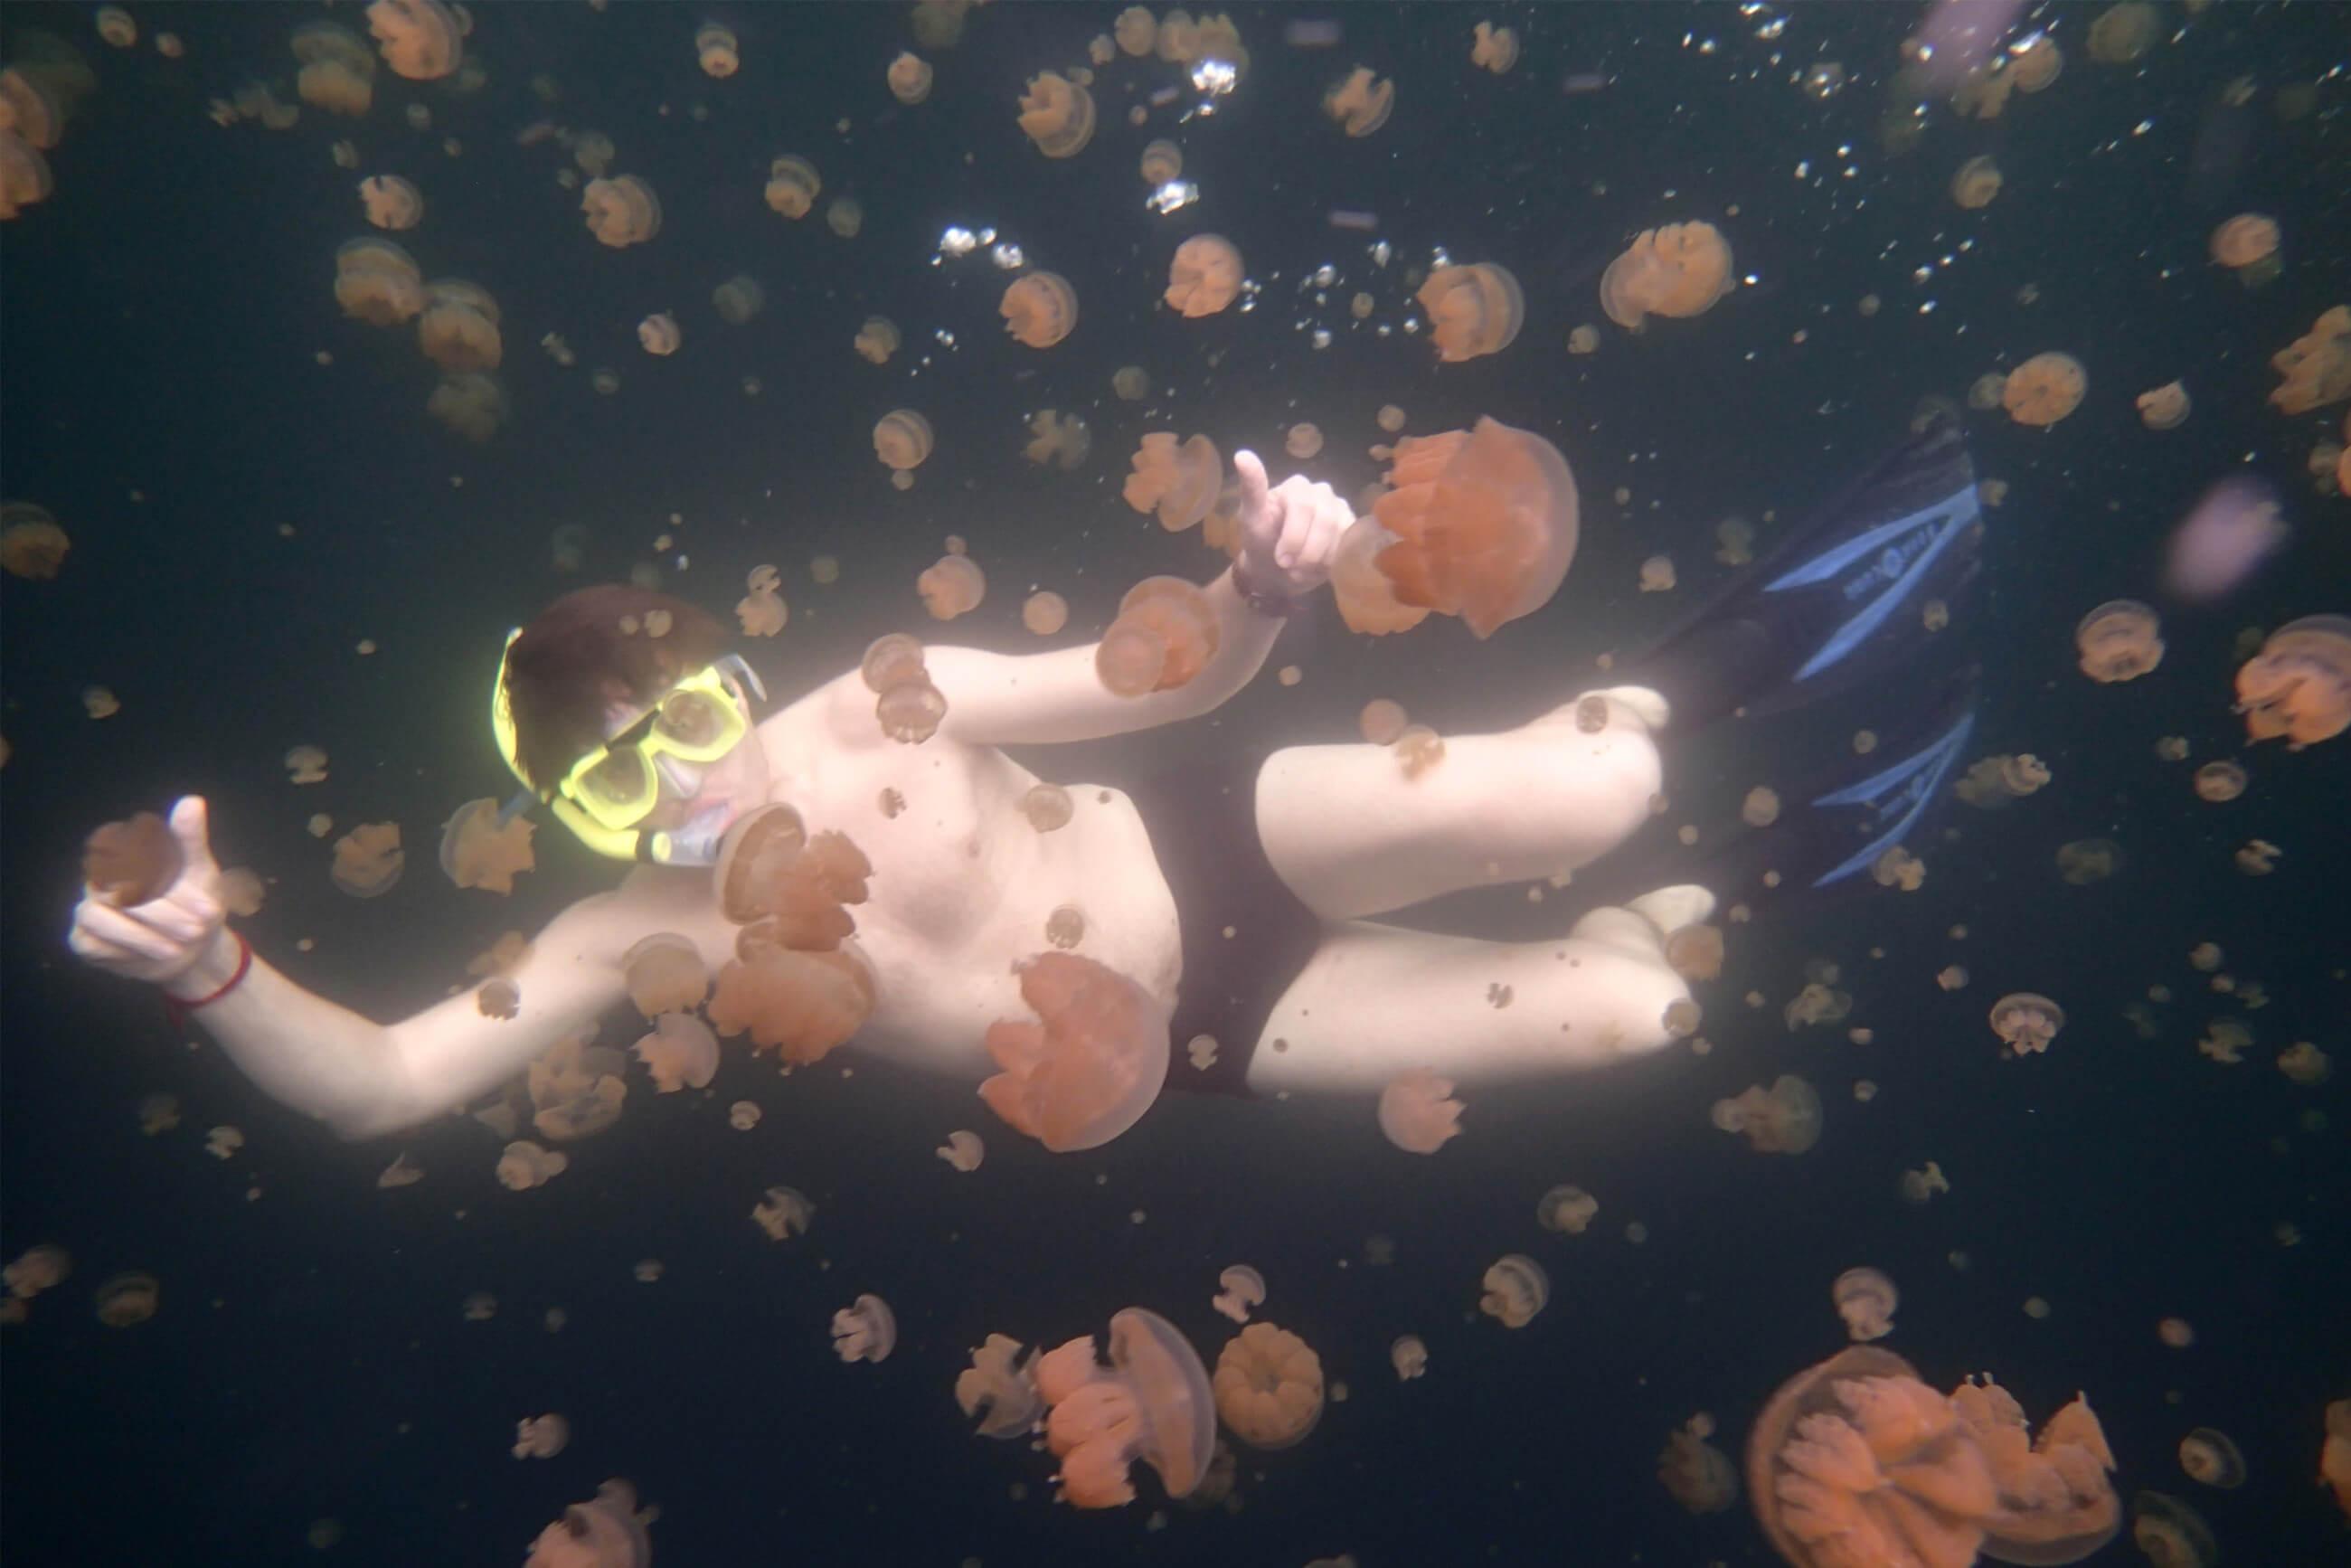 https://bubo.sk/uploads/galleries/7300/lubosfellner_palau_s-bubo-neriskujte-plavanie-s-meduzami-na-palau.jpg